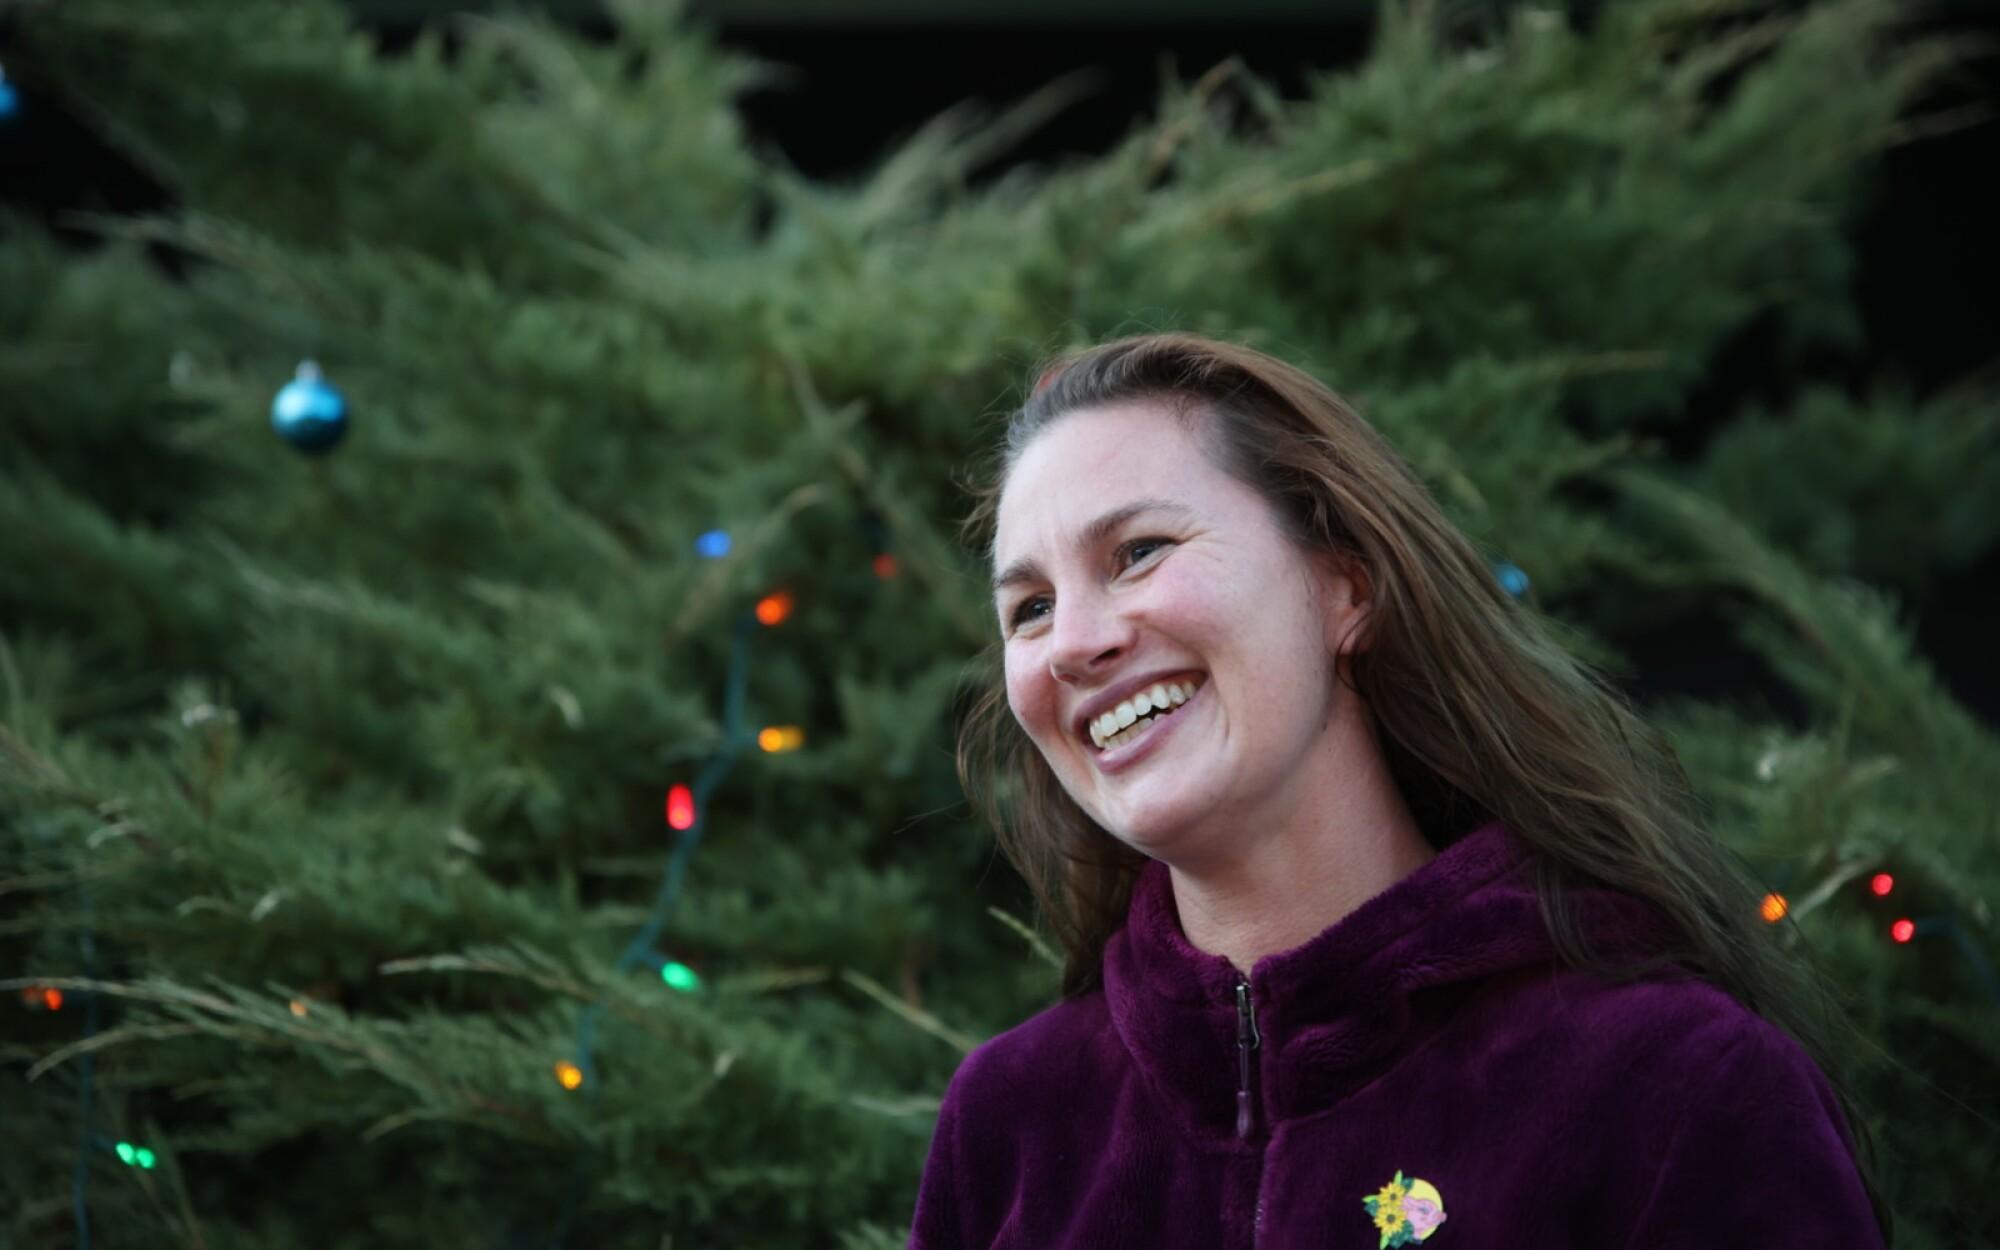 Boulder Creek native Hallie Greene has found comfort in helping others.